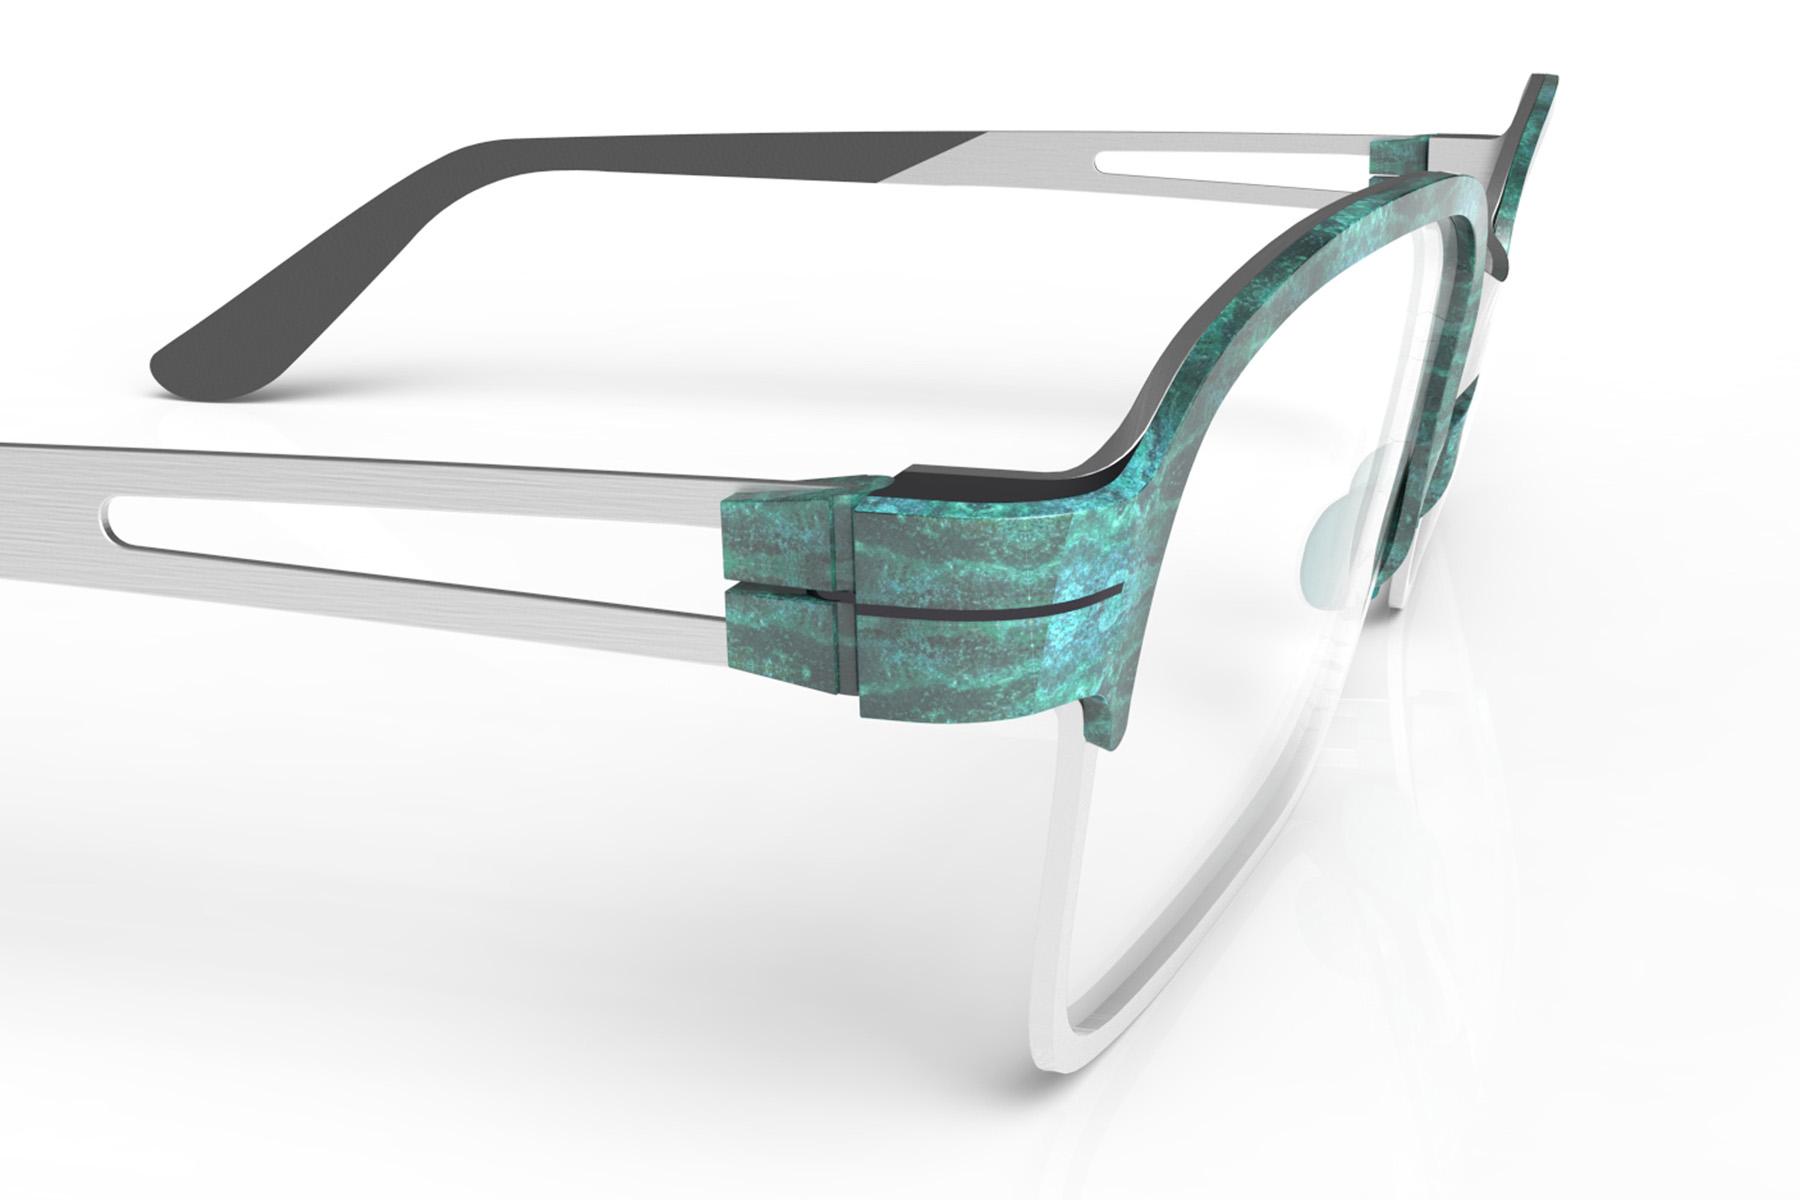 Luxottica - Full Metal Frame - Brignetti Longoni Design Studio